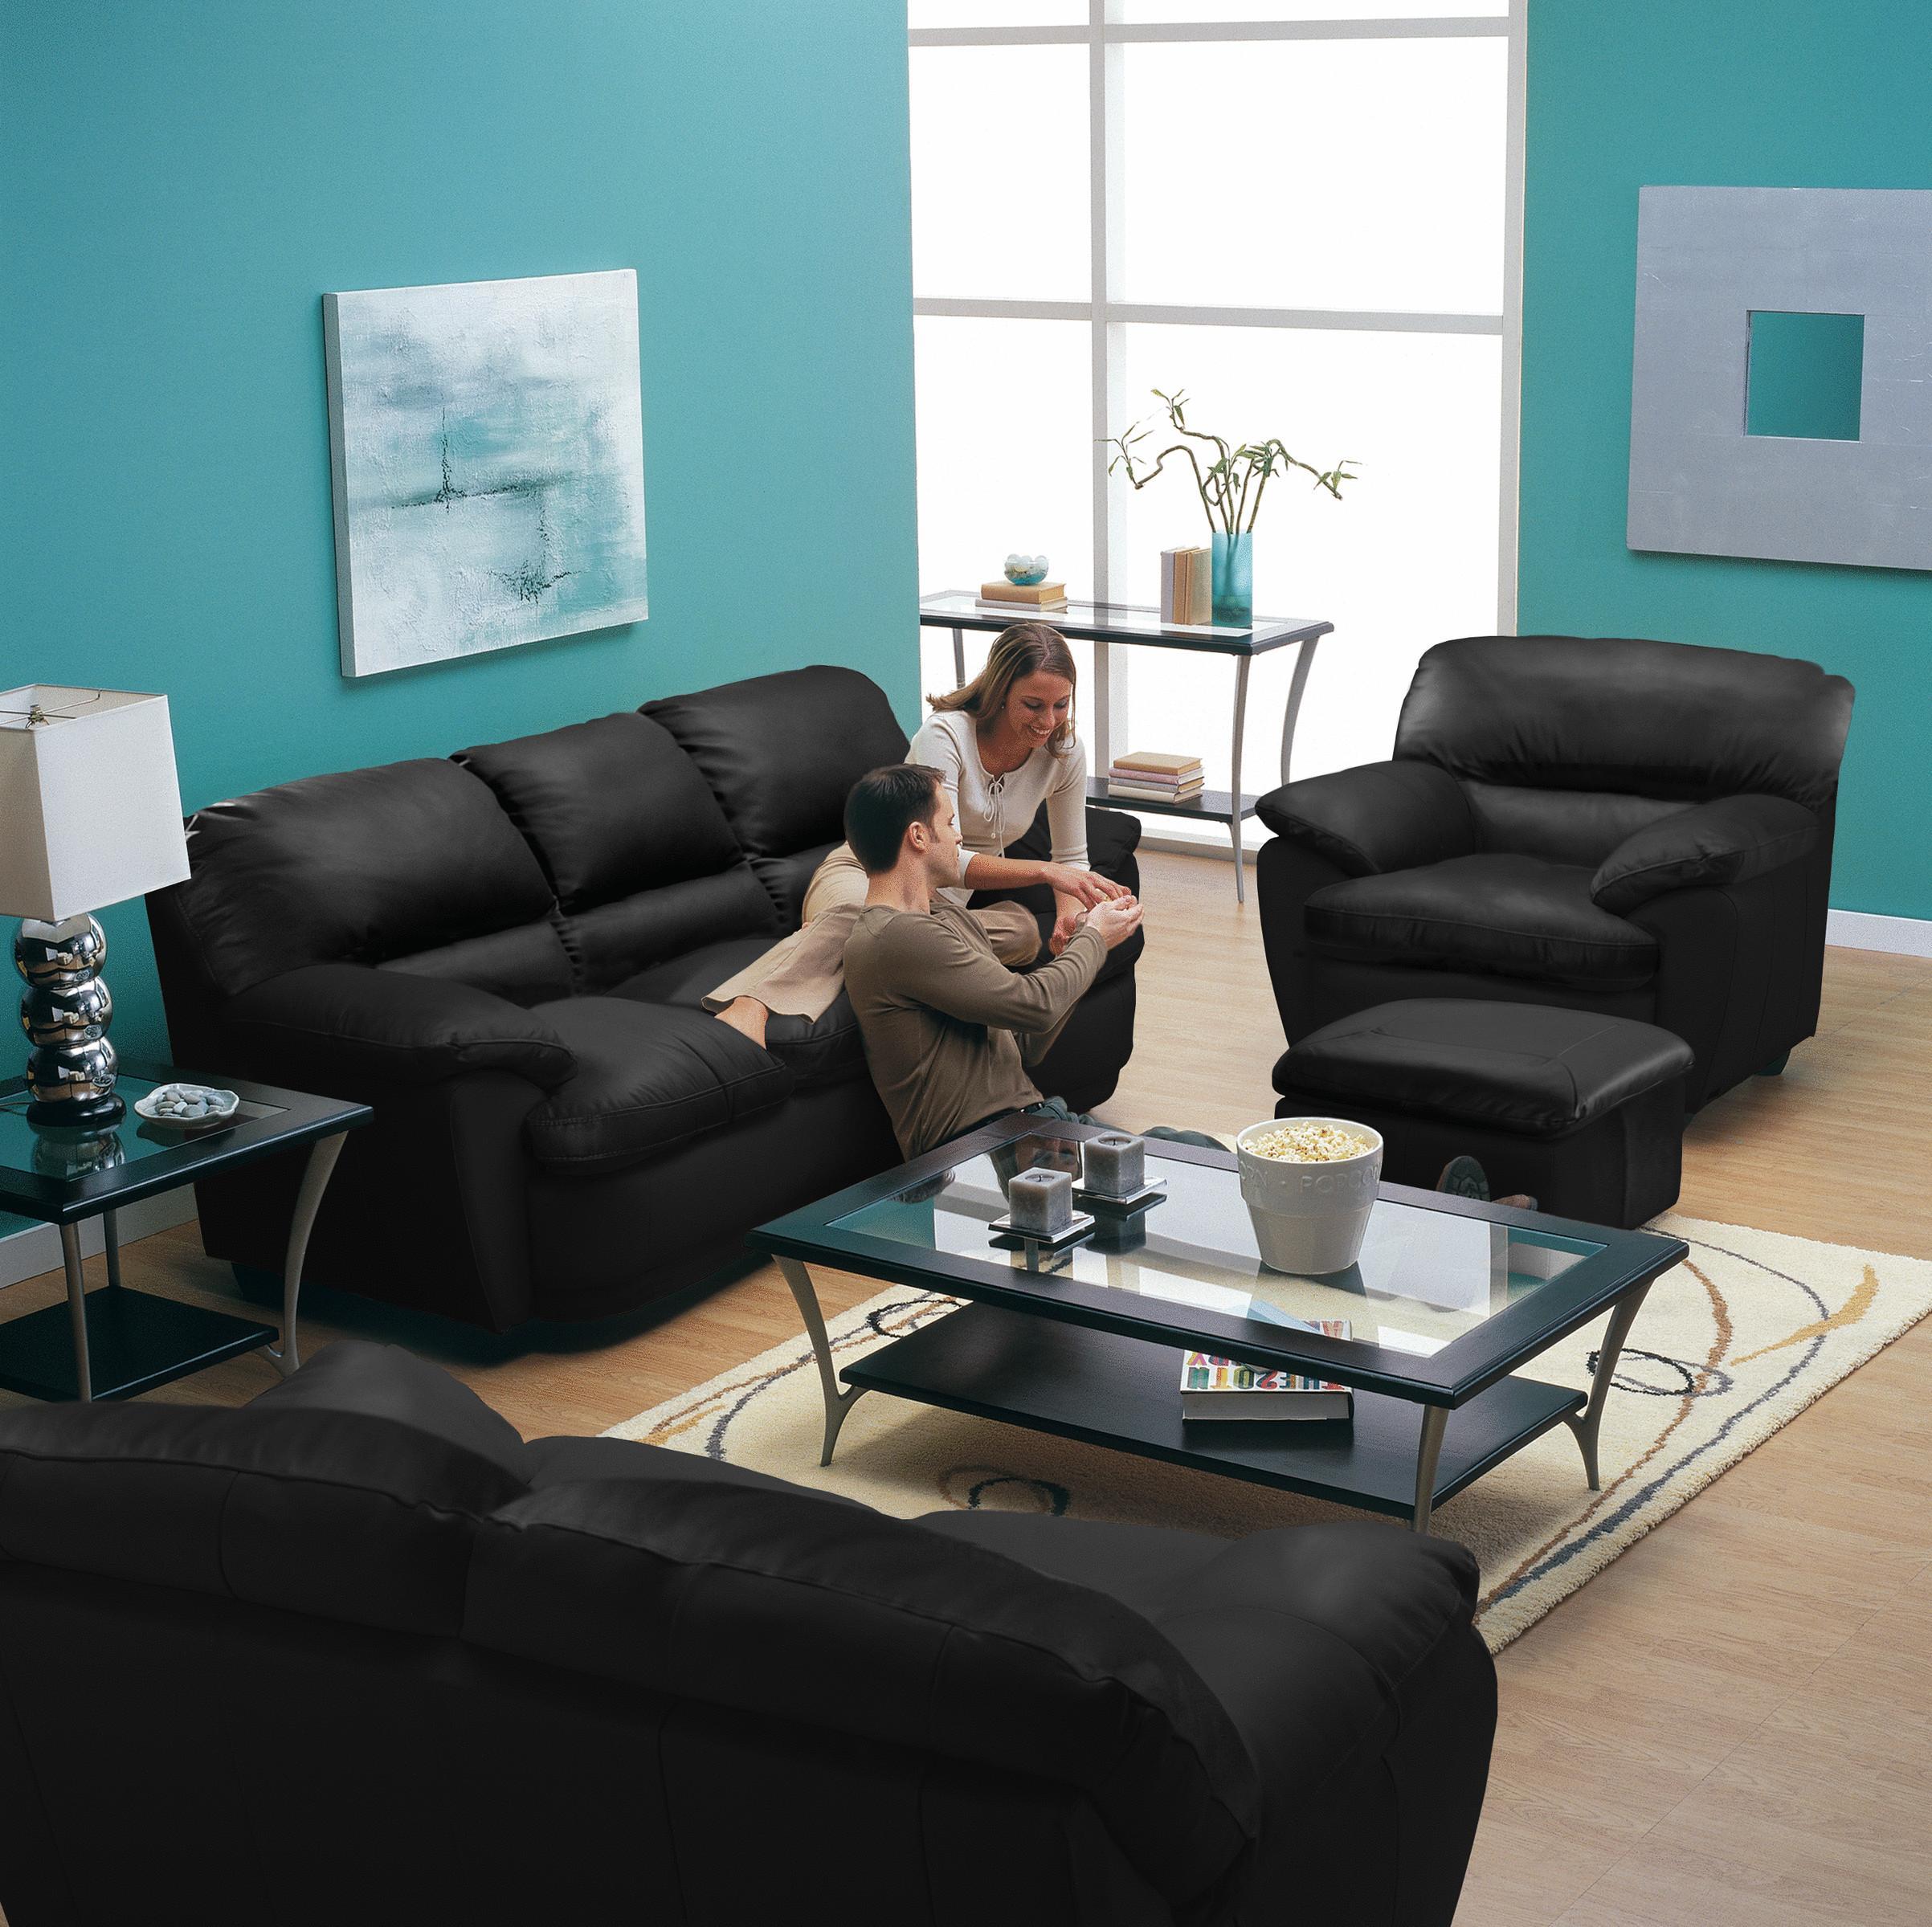 palliser chair and ottoman alite mantis harley casual upholstered